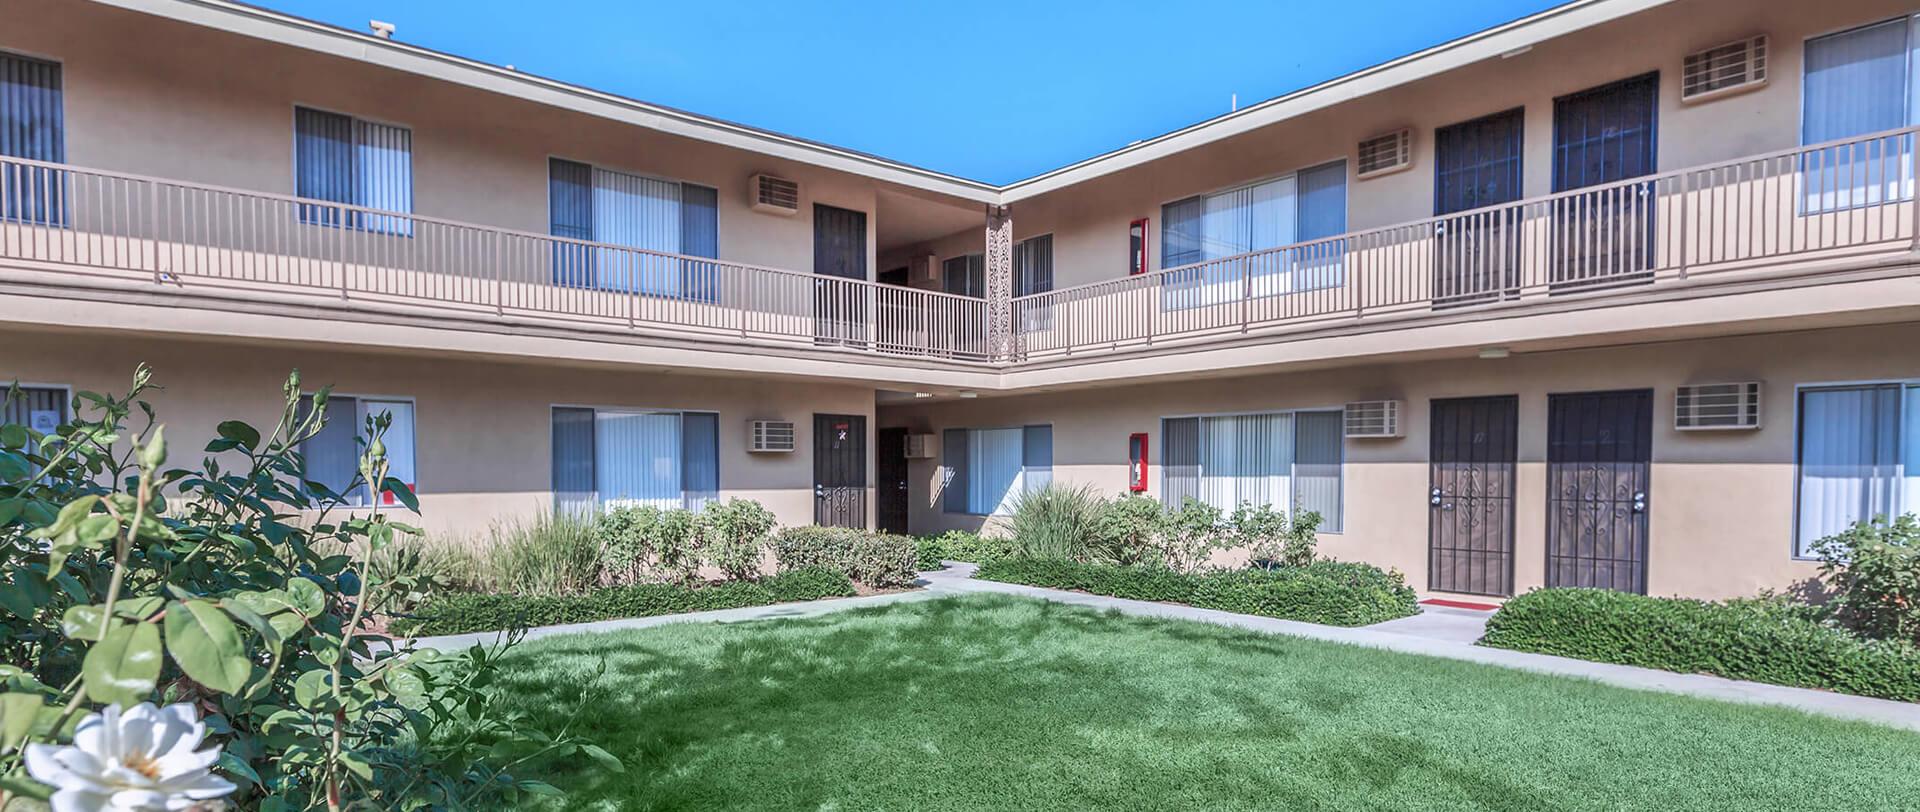 Orleans Apartment Homes Apartments In Anaheim Ca